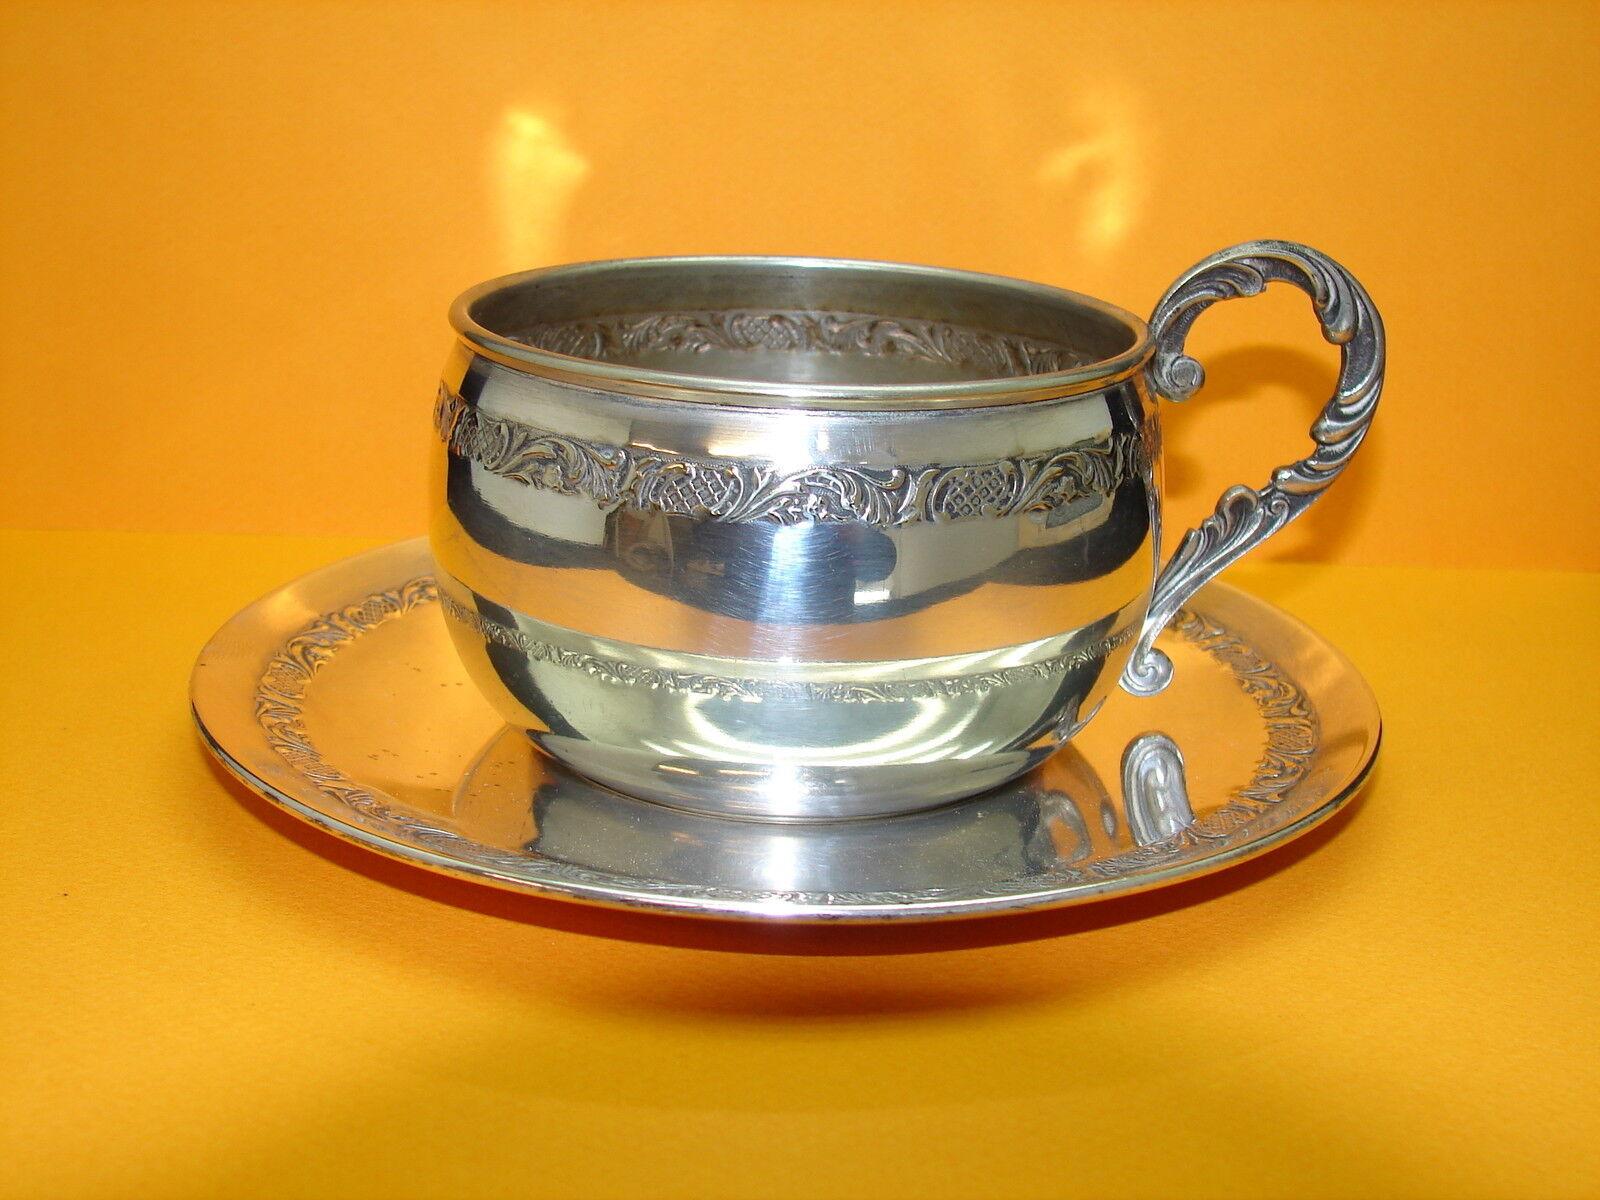 Jolie antigua taza metal chapado en silver